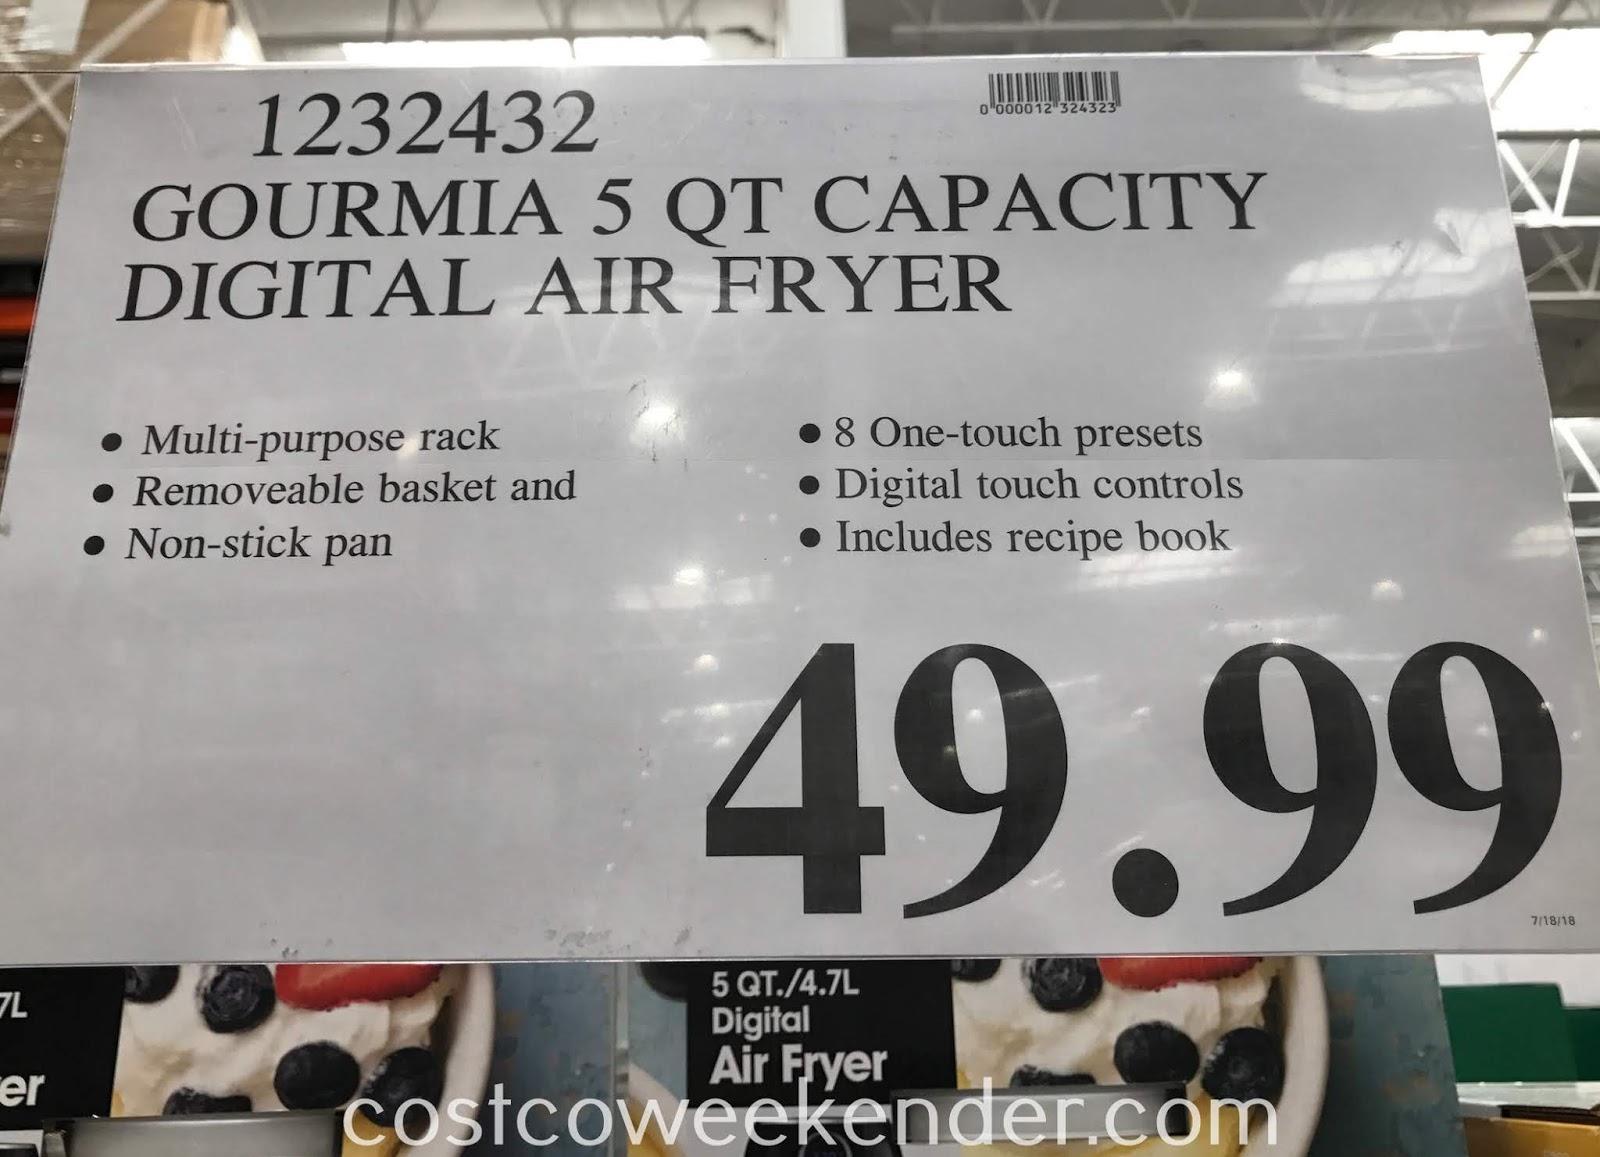 Deal for the Gourmia 5qt Digital Air Fryer at Costco